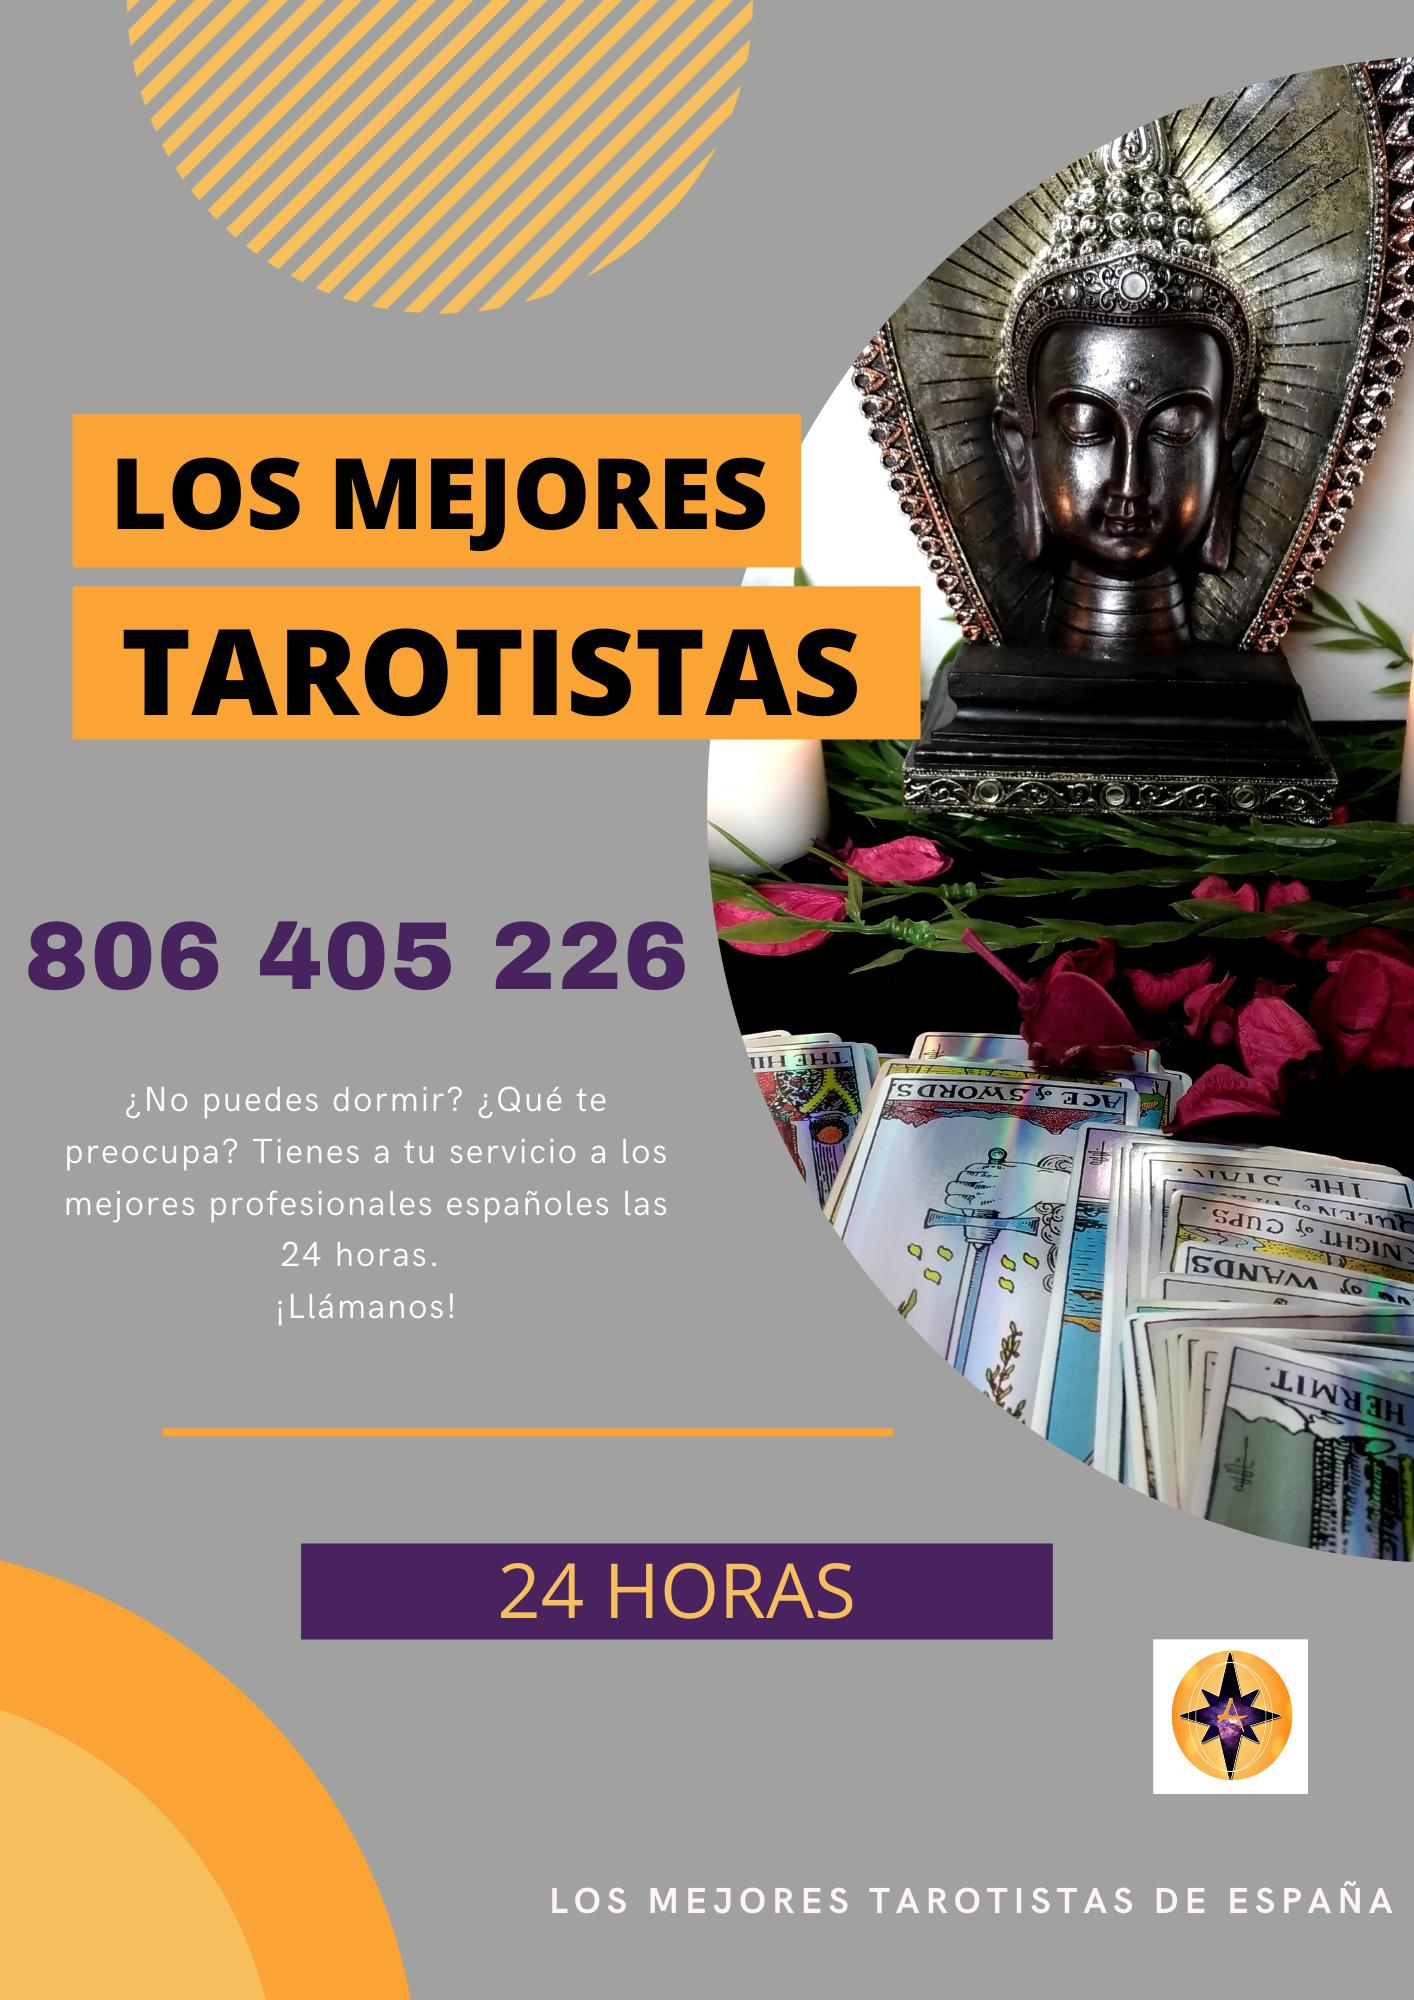 TAROT 806 405 226